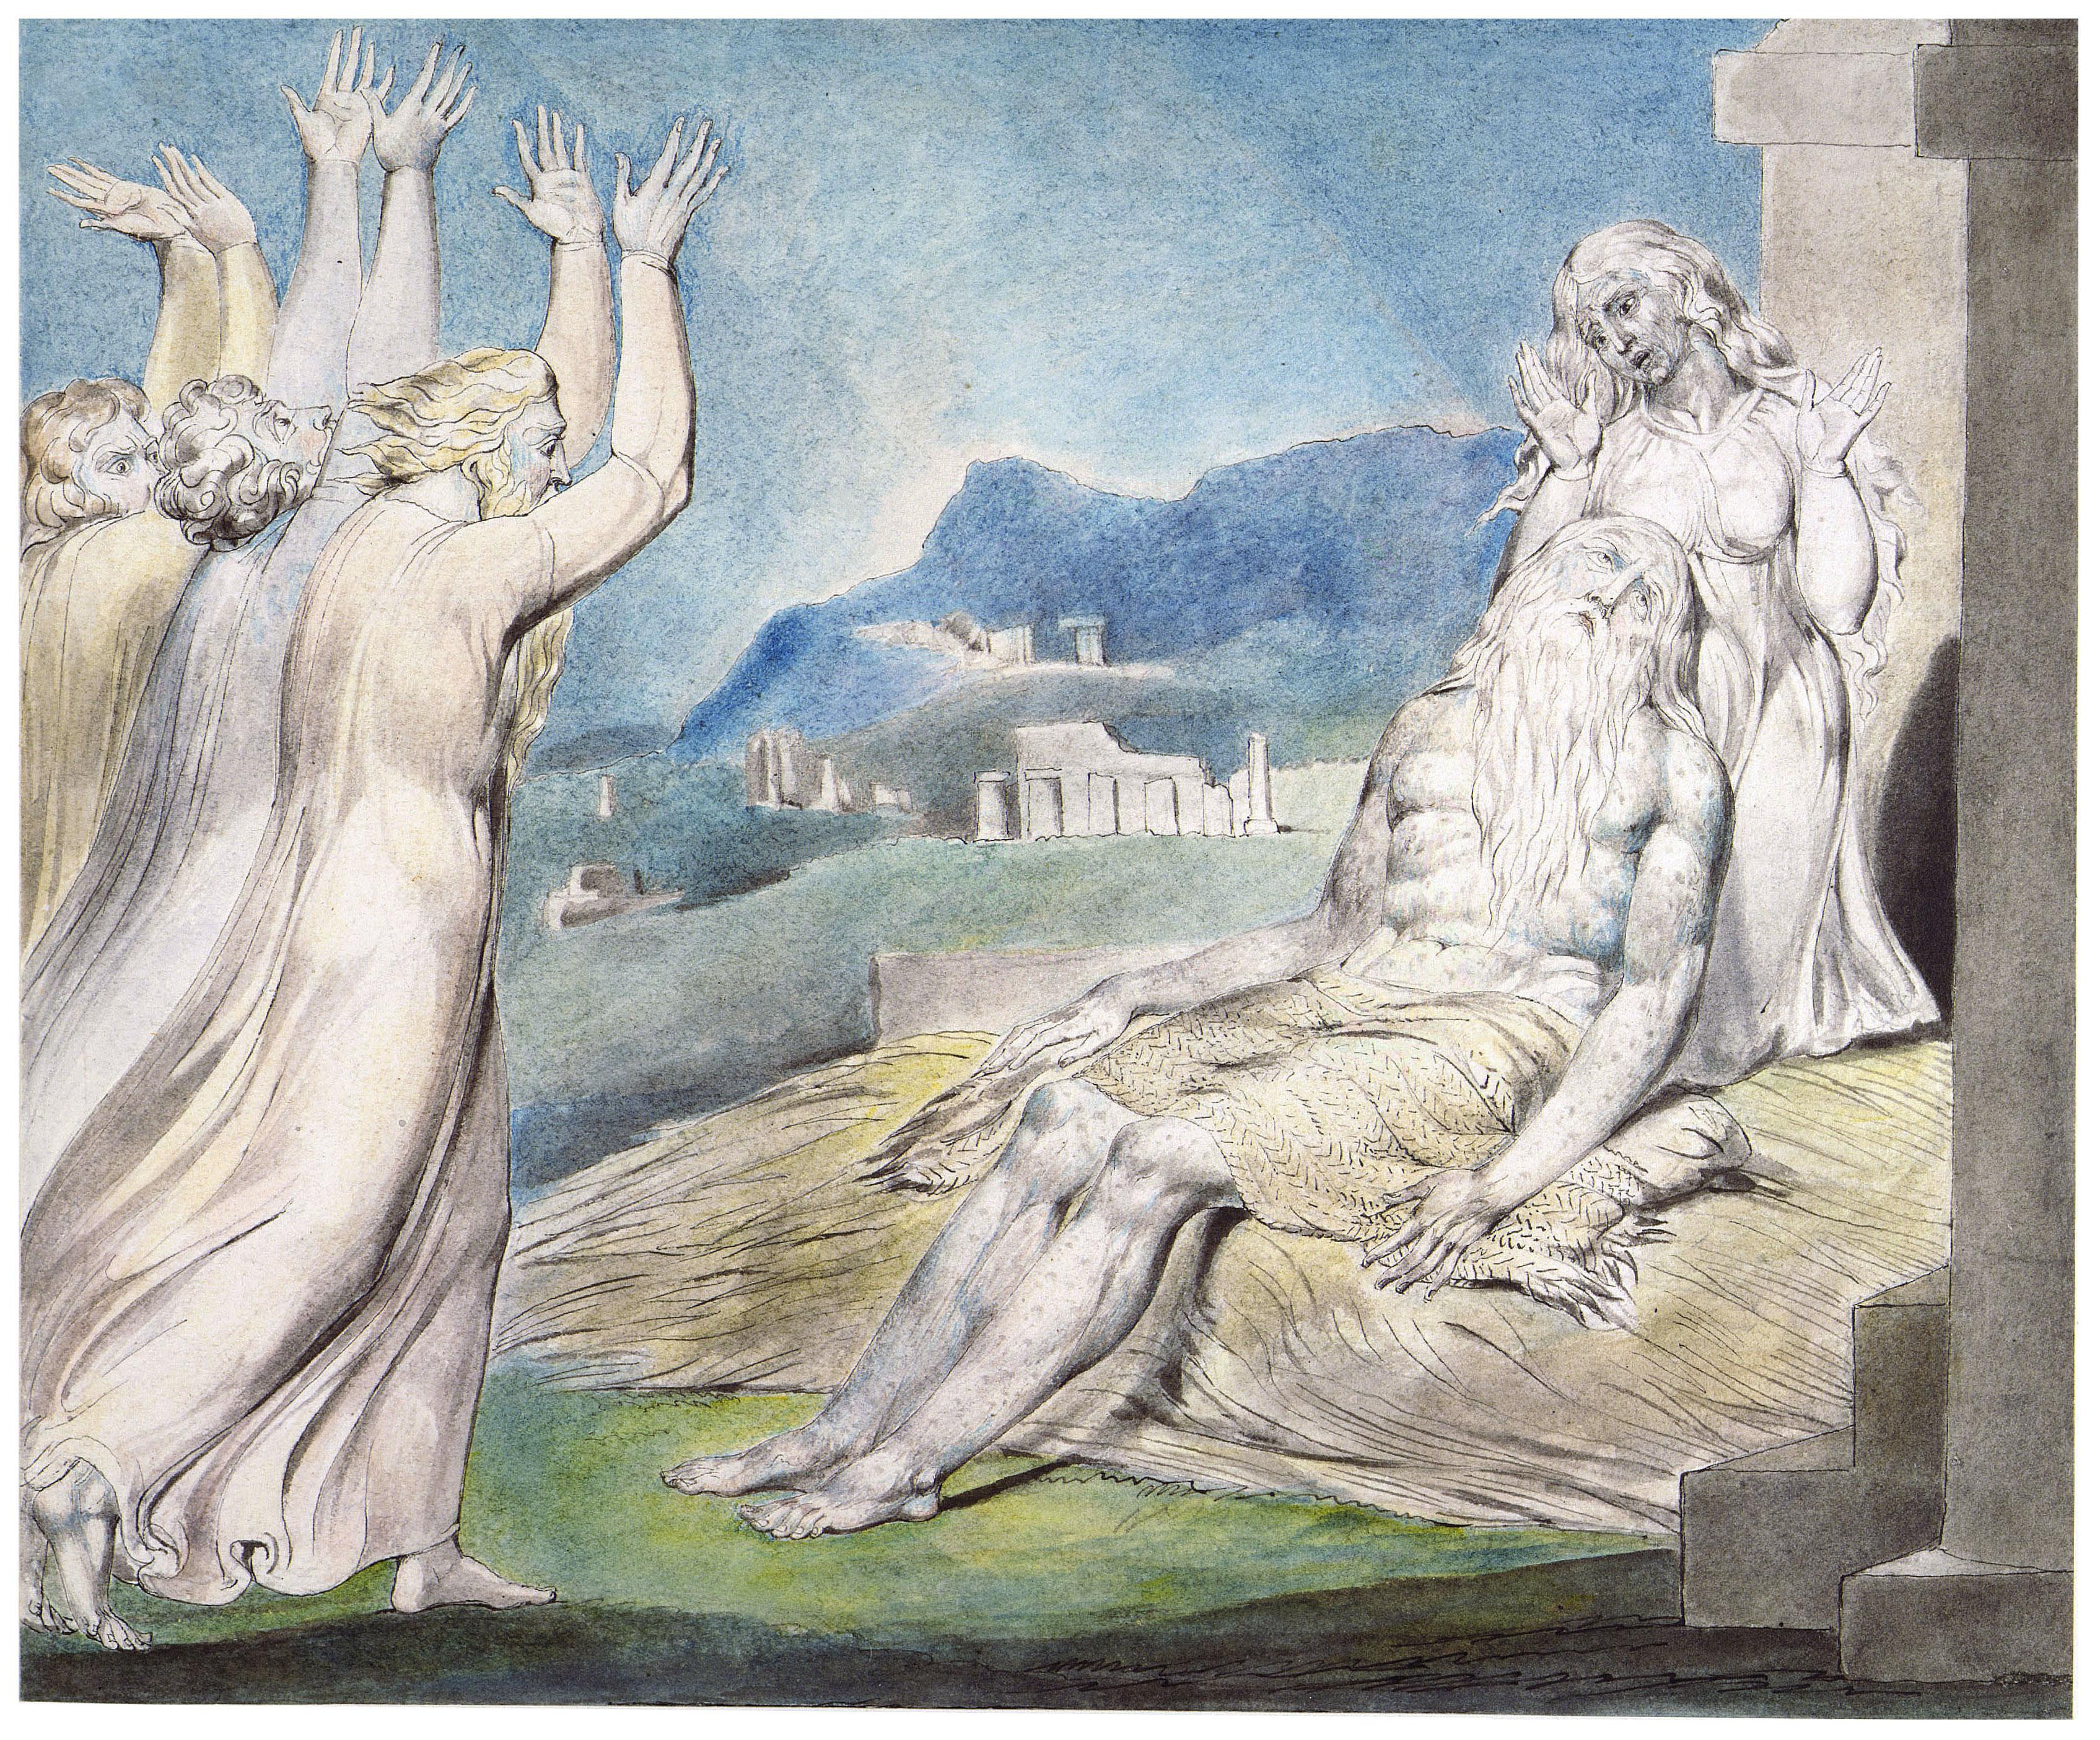 Job's Comforters | The Bible Through Artists' Eyes